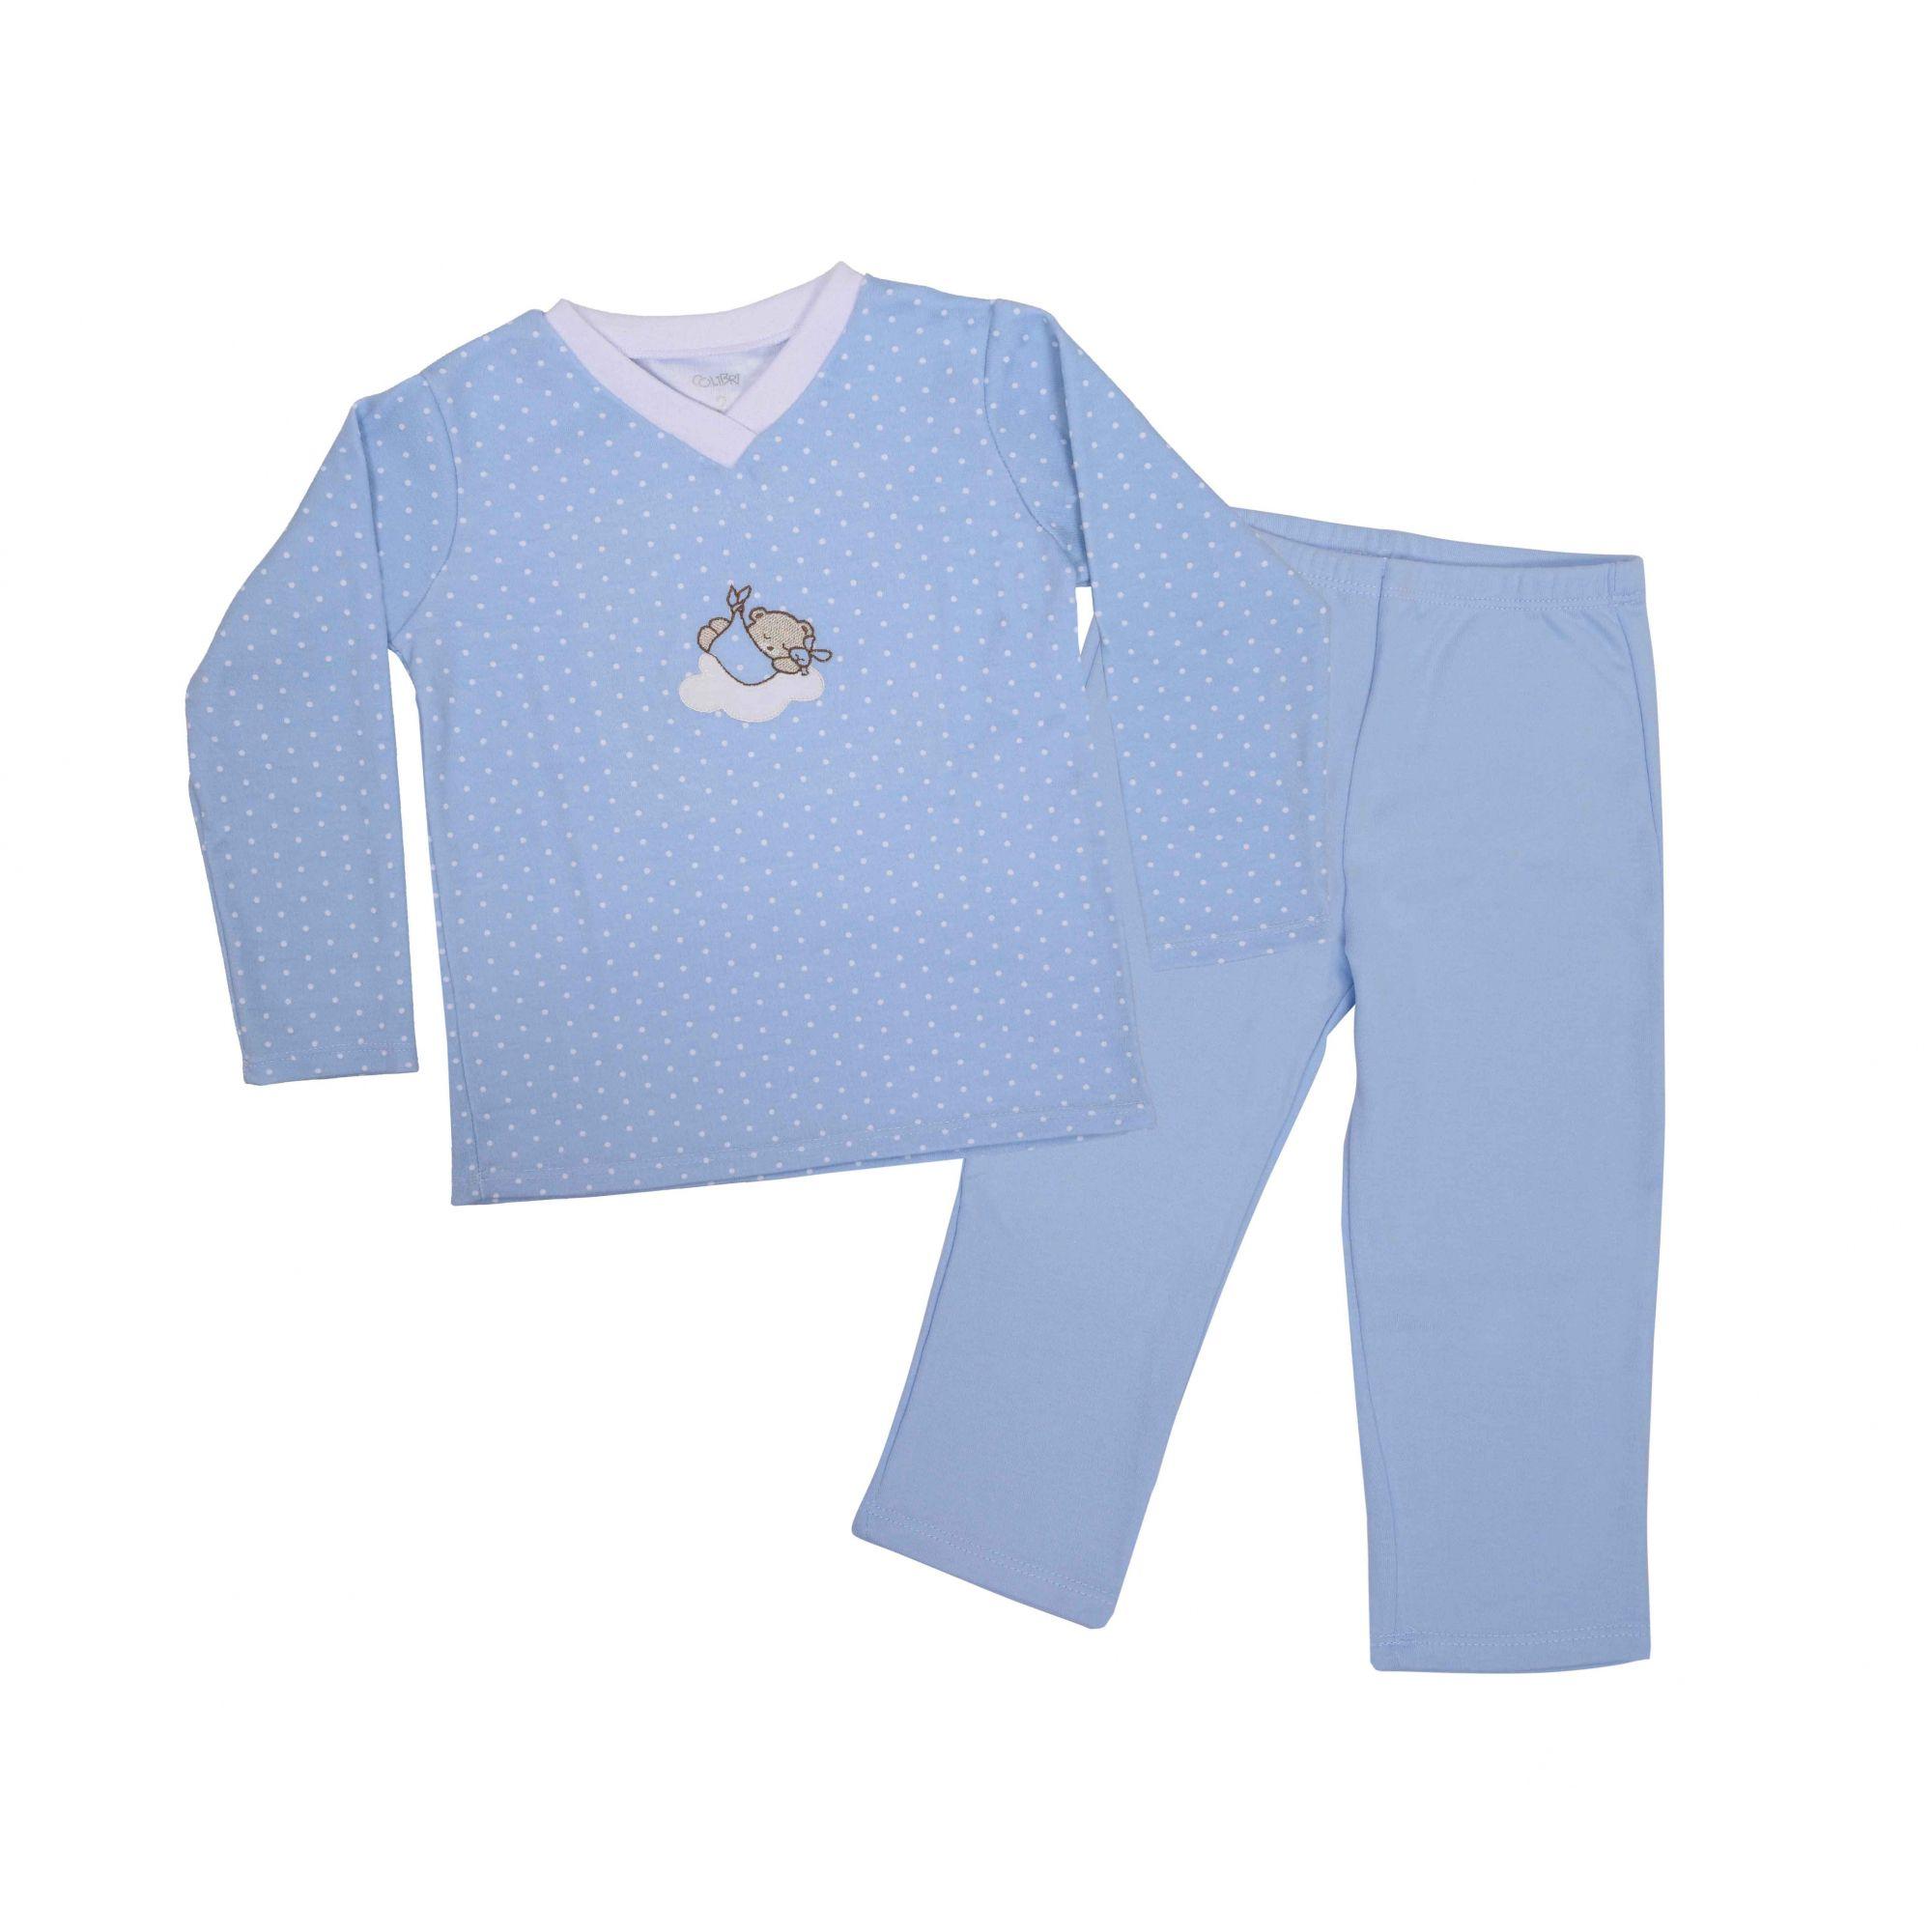 Kit Pijama Camiseta Manga Longa e Calça Azul